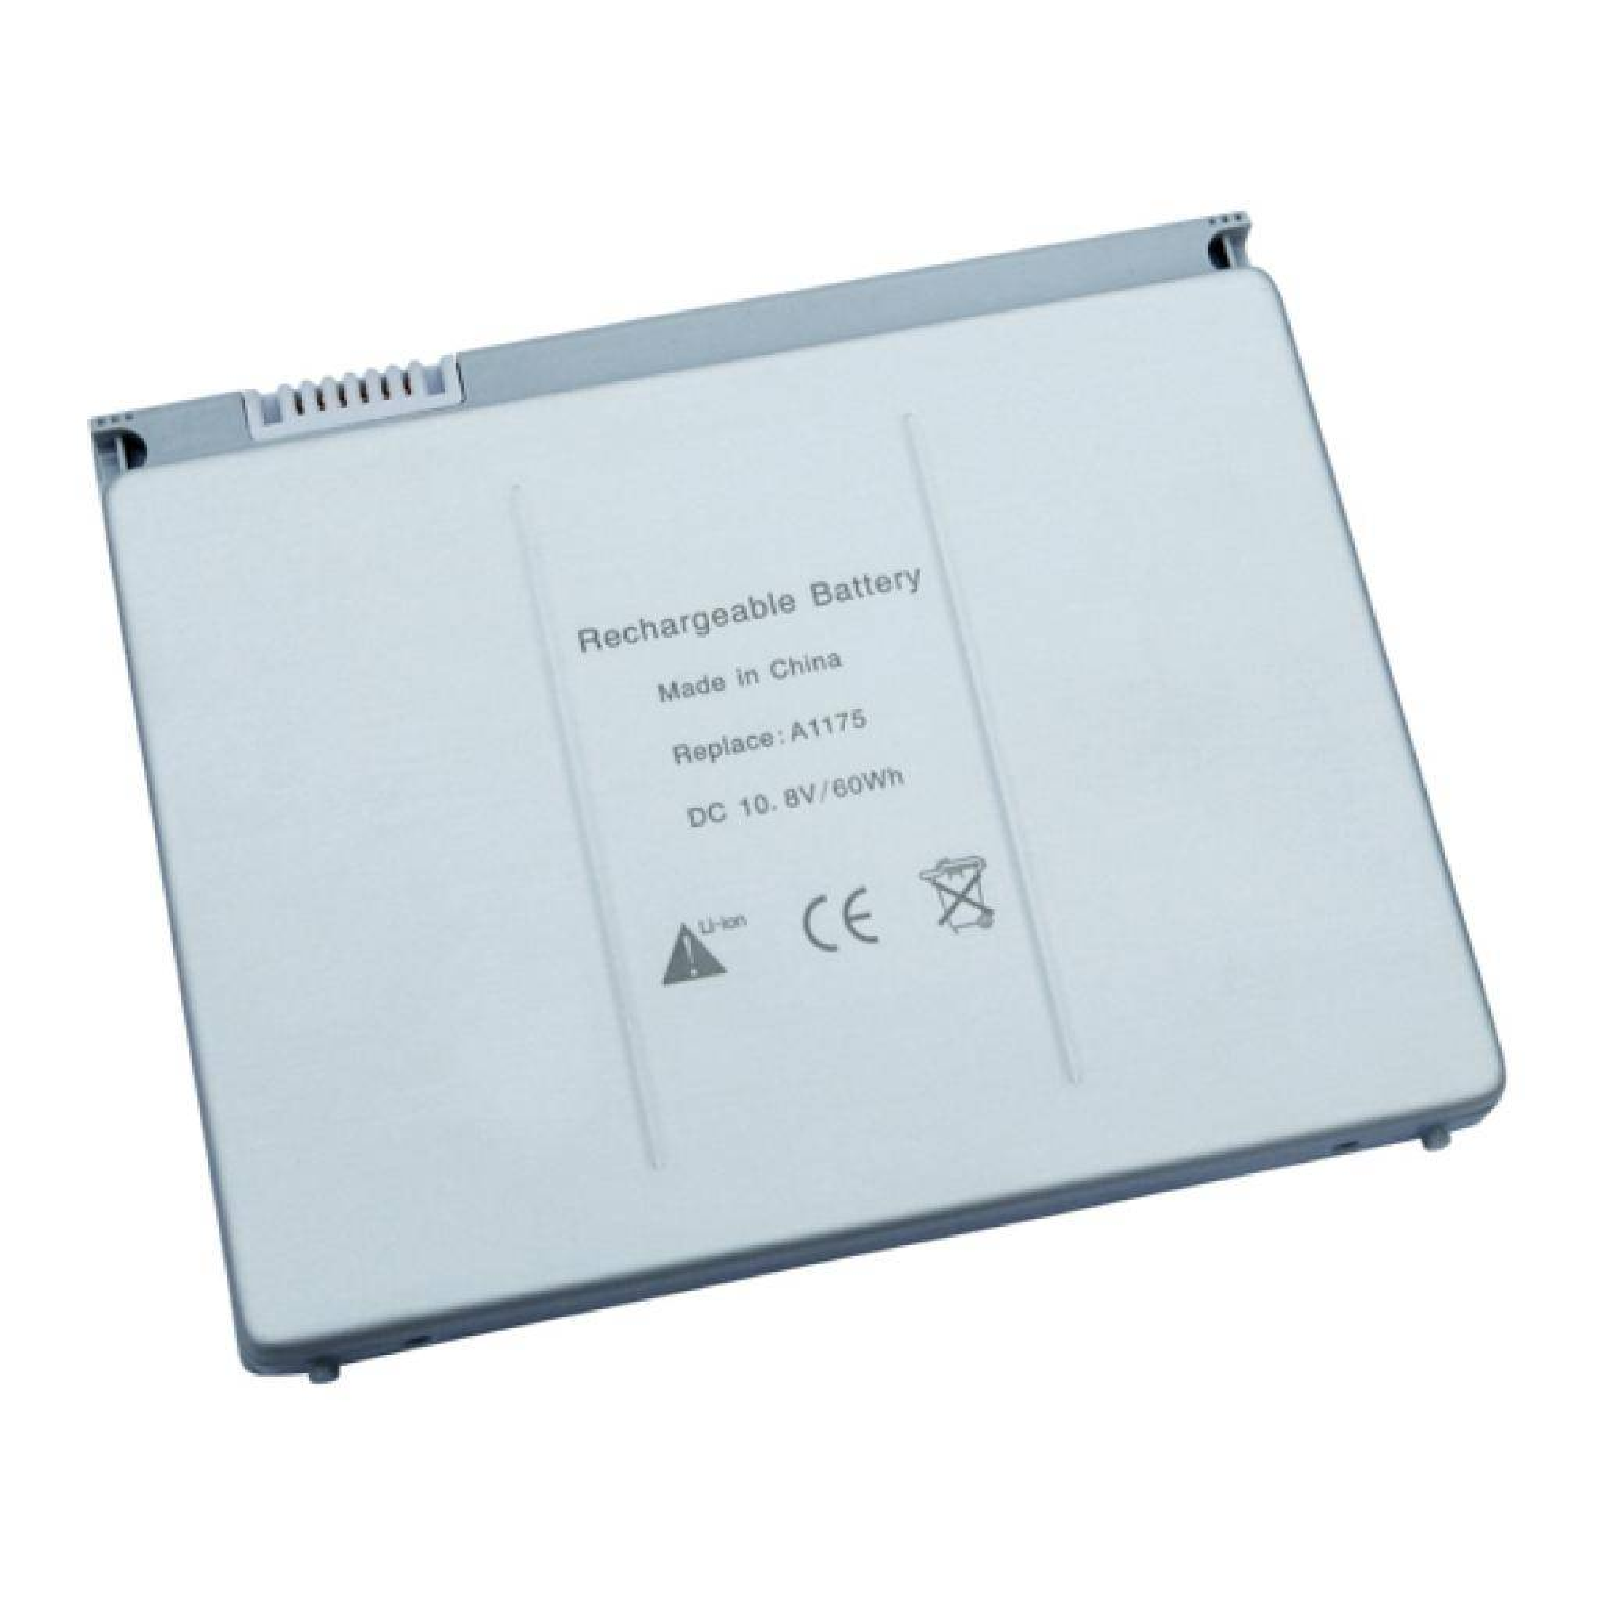 "Аккумулятор для ноутбука APPLE MacBook Pro 15"" (A1175) 10.8V 5200mAh PowerPlant (NB00000044)"